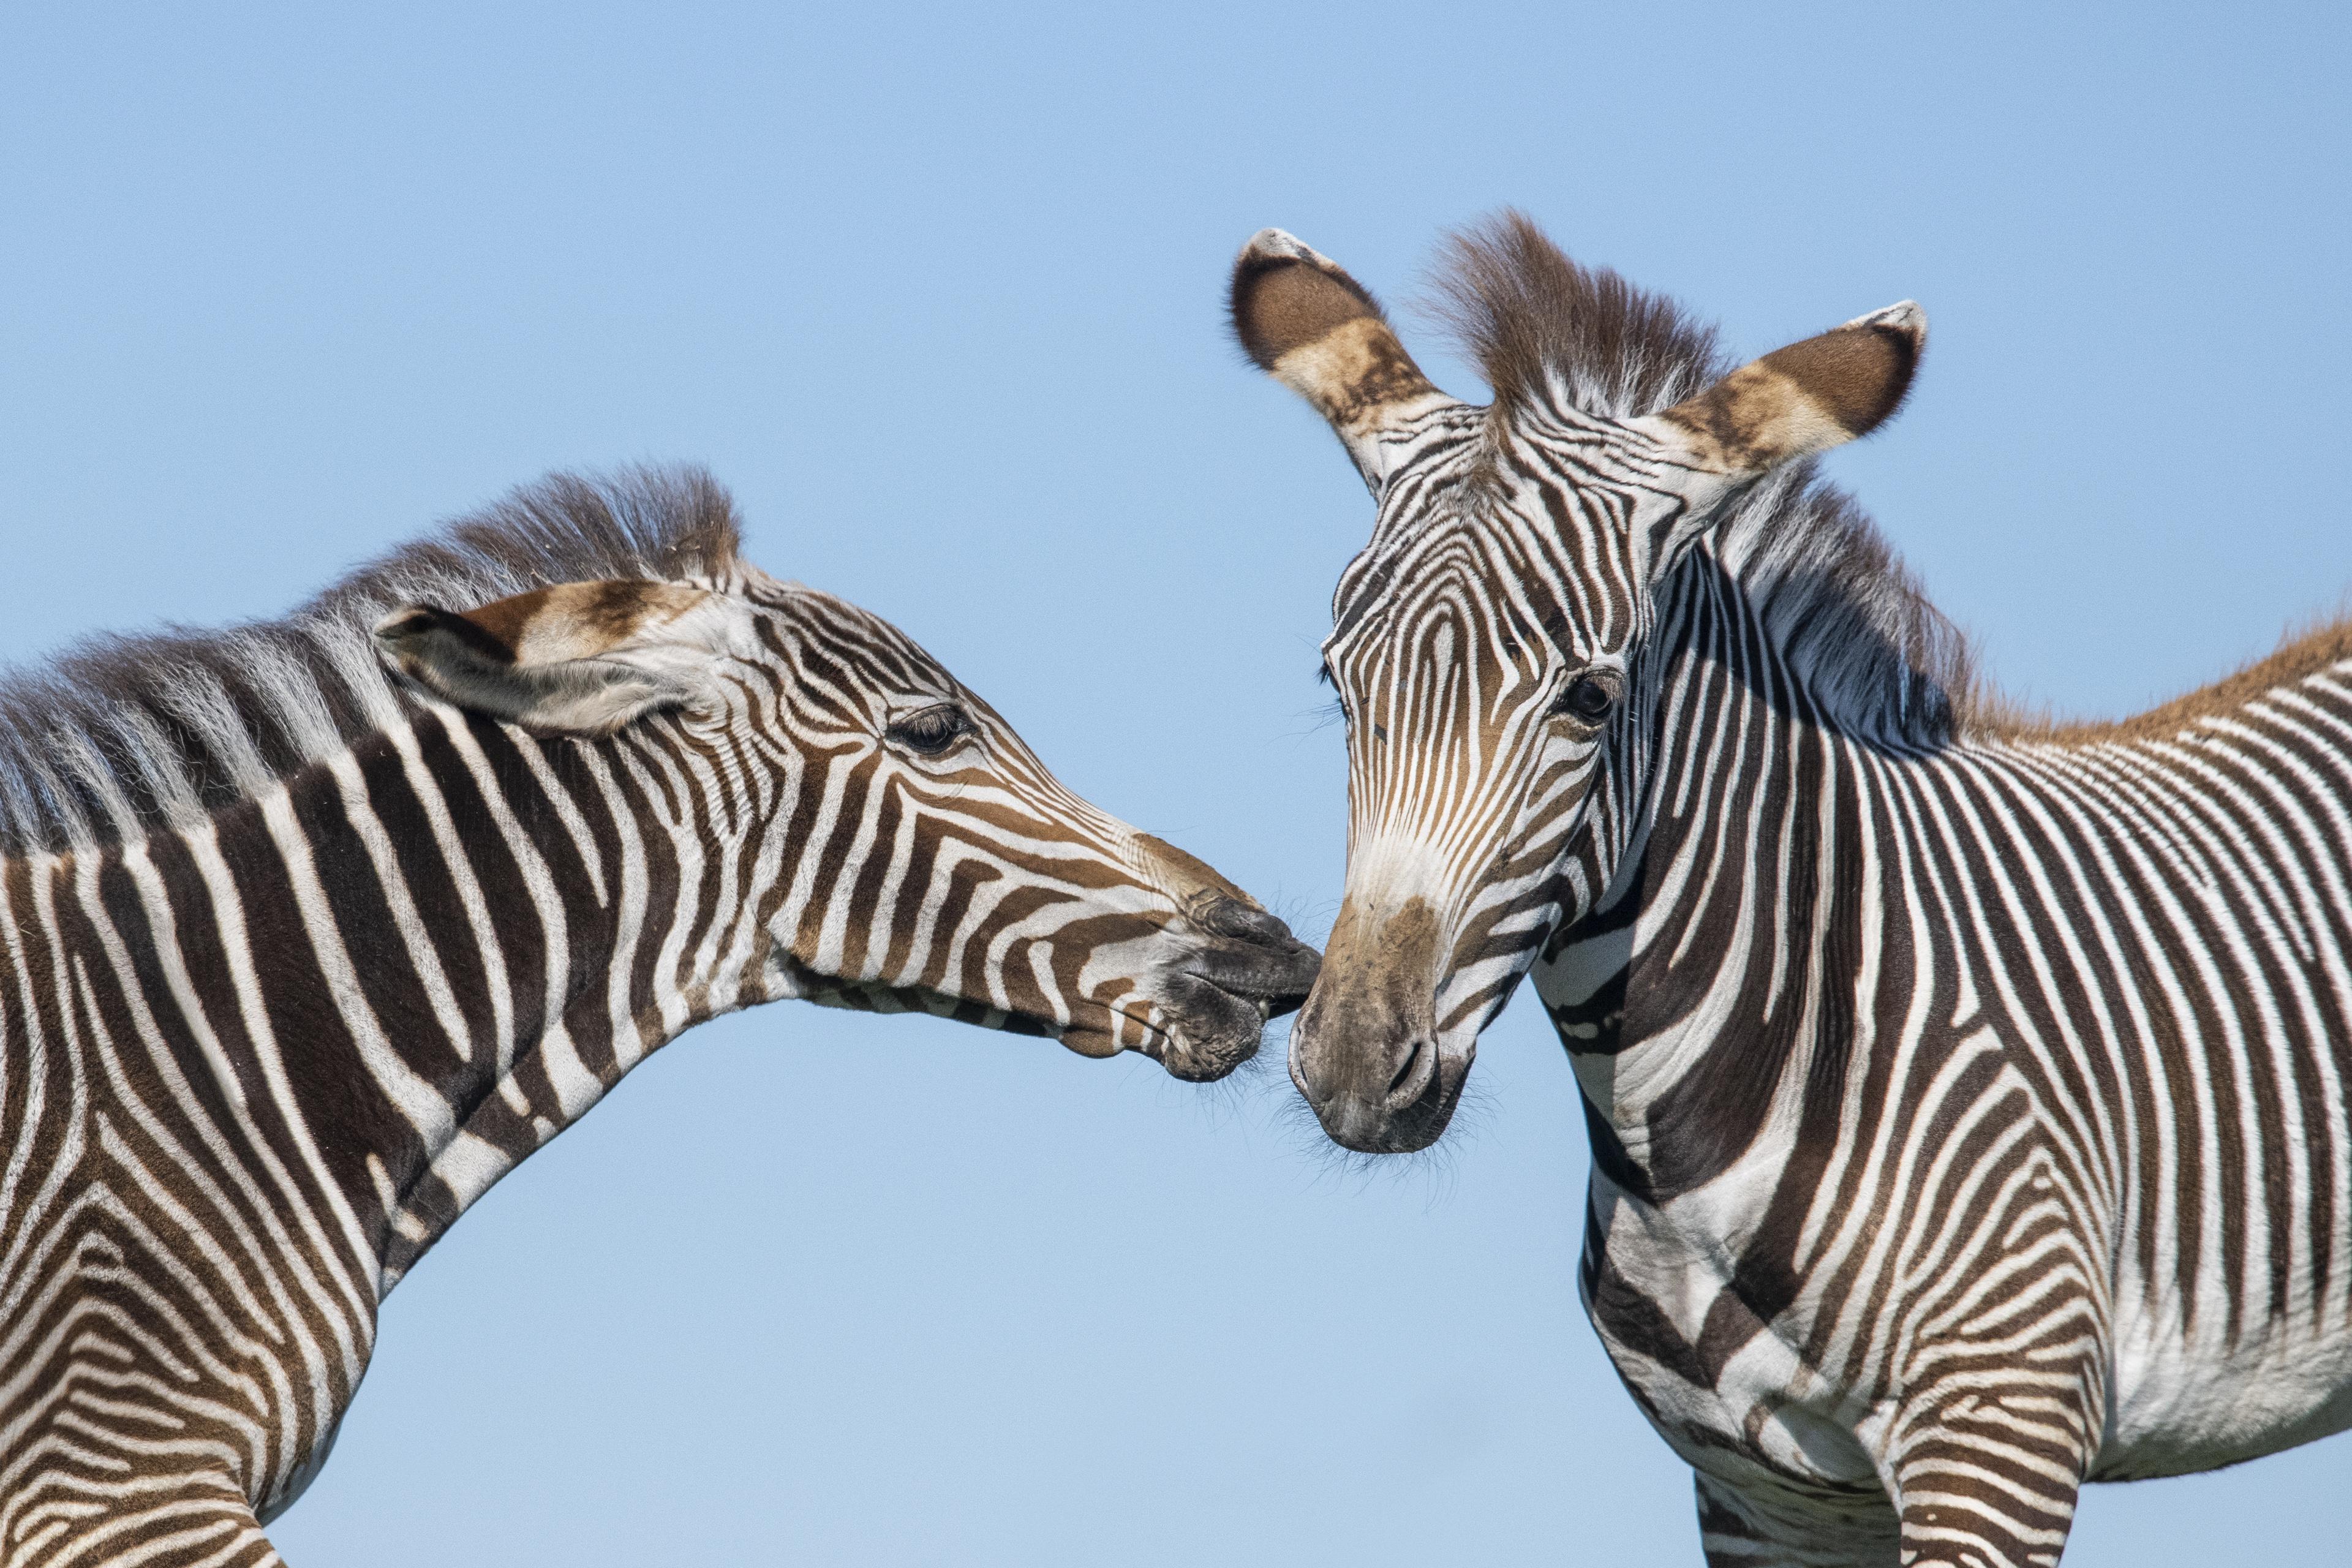 21185e514f WMSP-Safari-Grevy s Zebra Foals 09 - West Midland Safari   Leisure Park